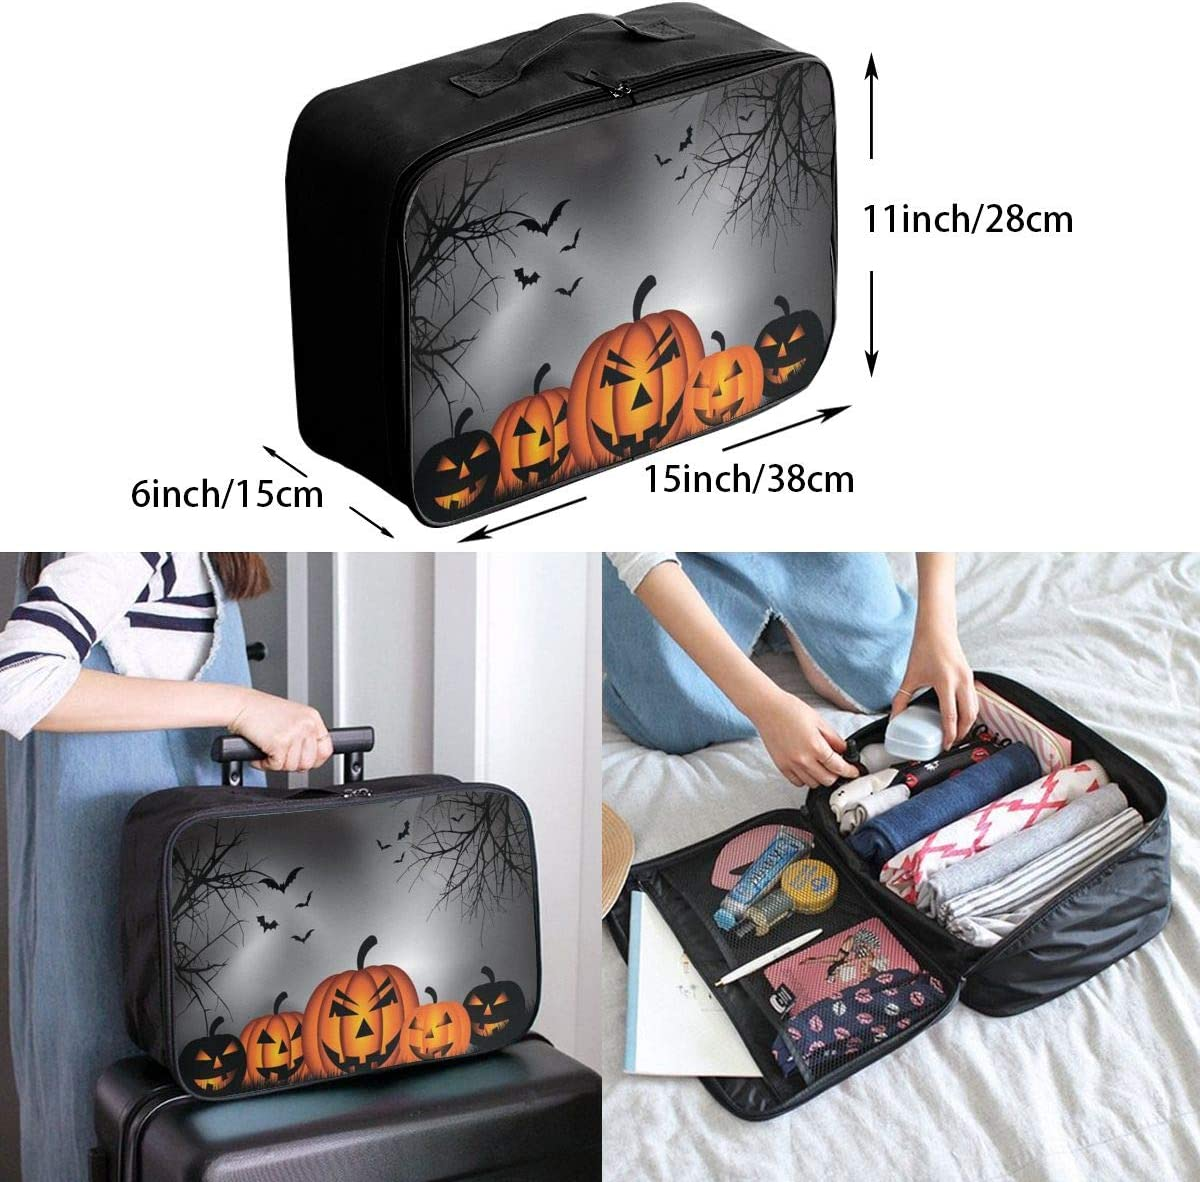 Yunshm Happy Halloween Dark Night Personalized Trolley Handbag Waterproof Unisex Large Capacity For Business Travel Storage